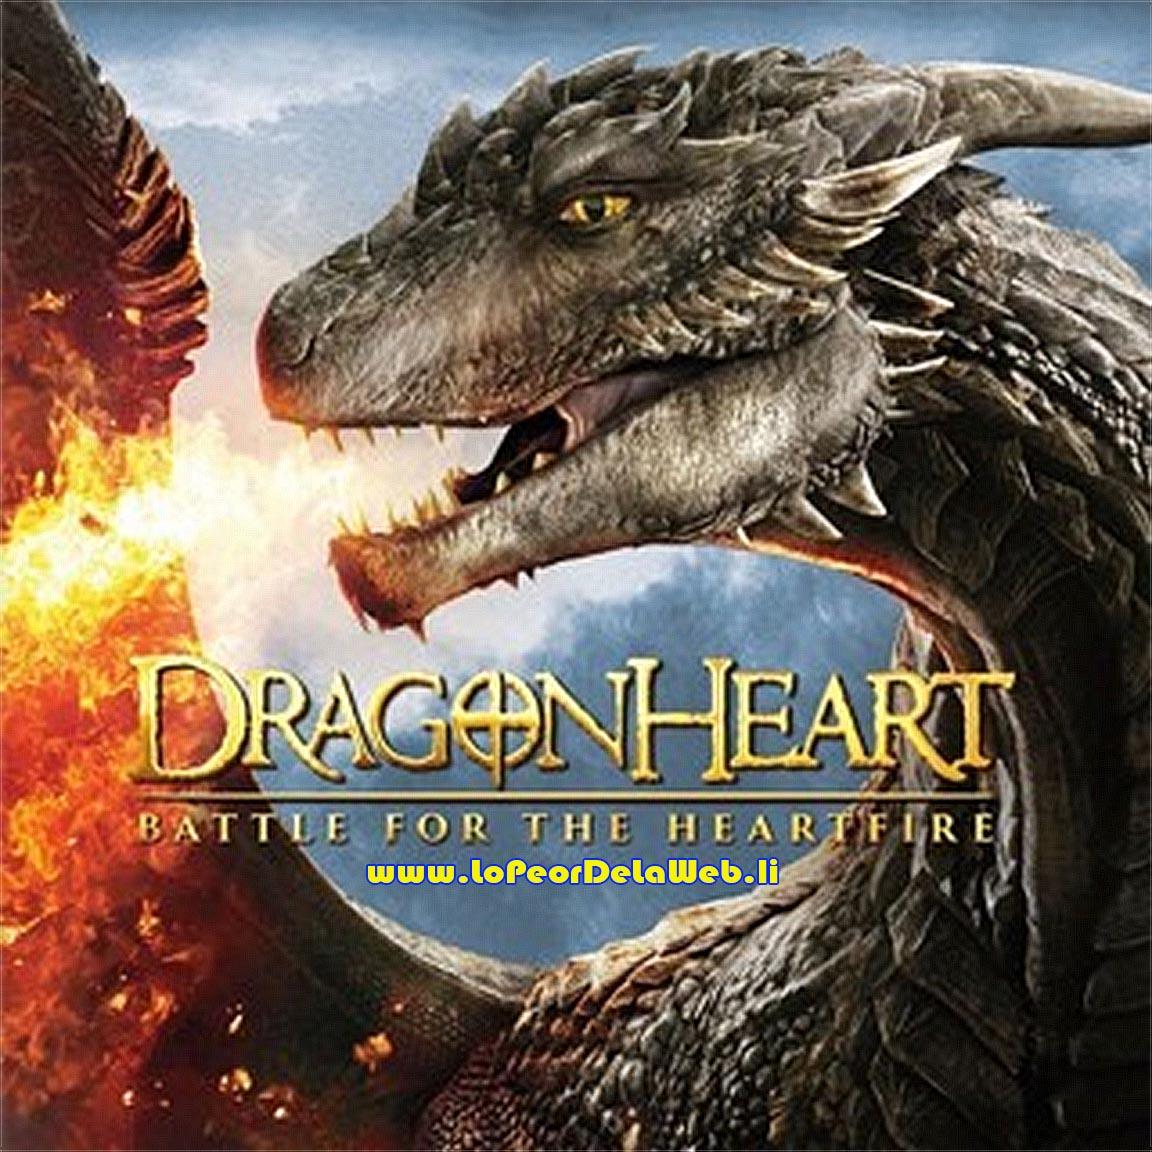 Dragonheart: Battle for the Heartfire (2017 - 1080p)